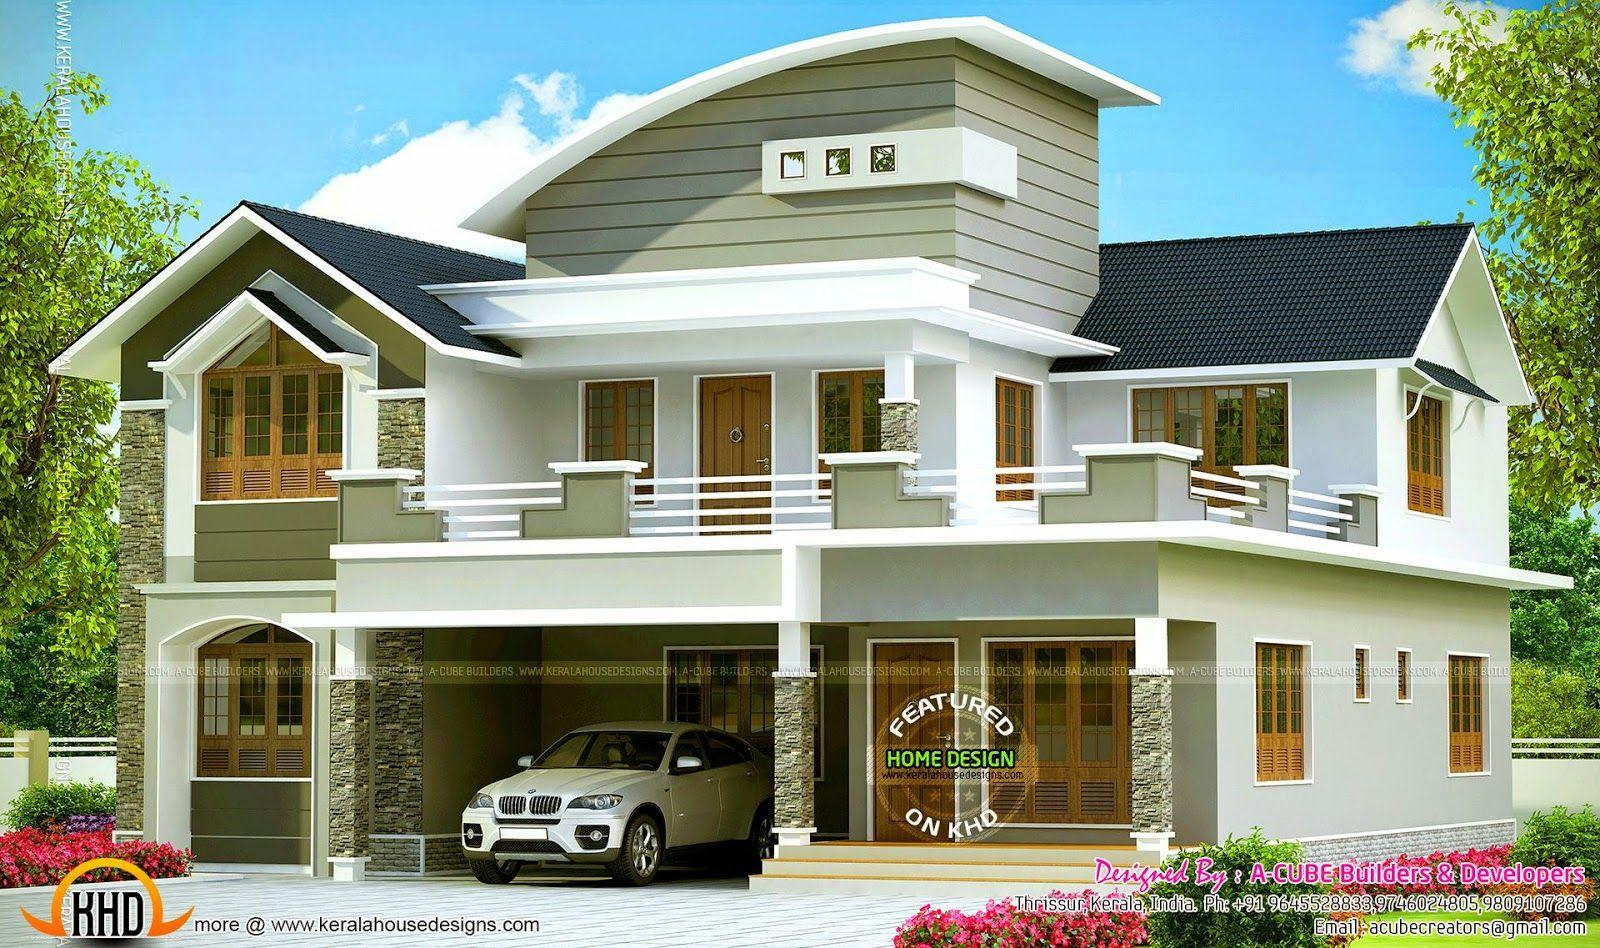 Villaelevationg houses pinterest house modern